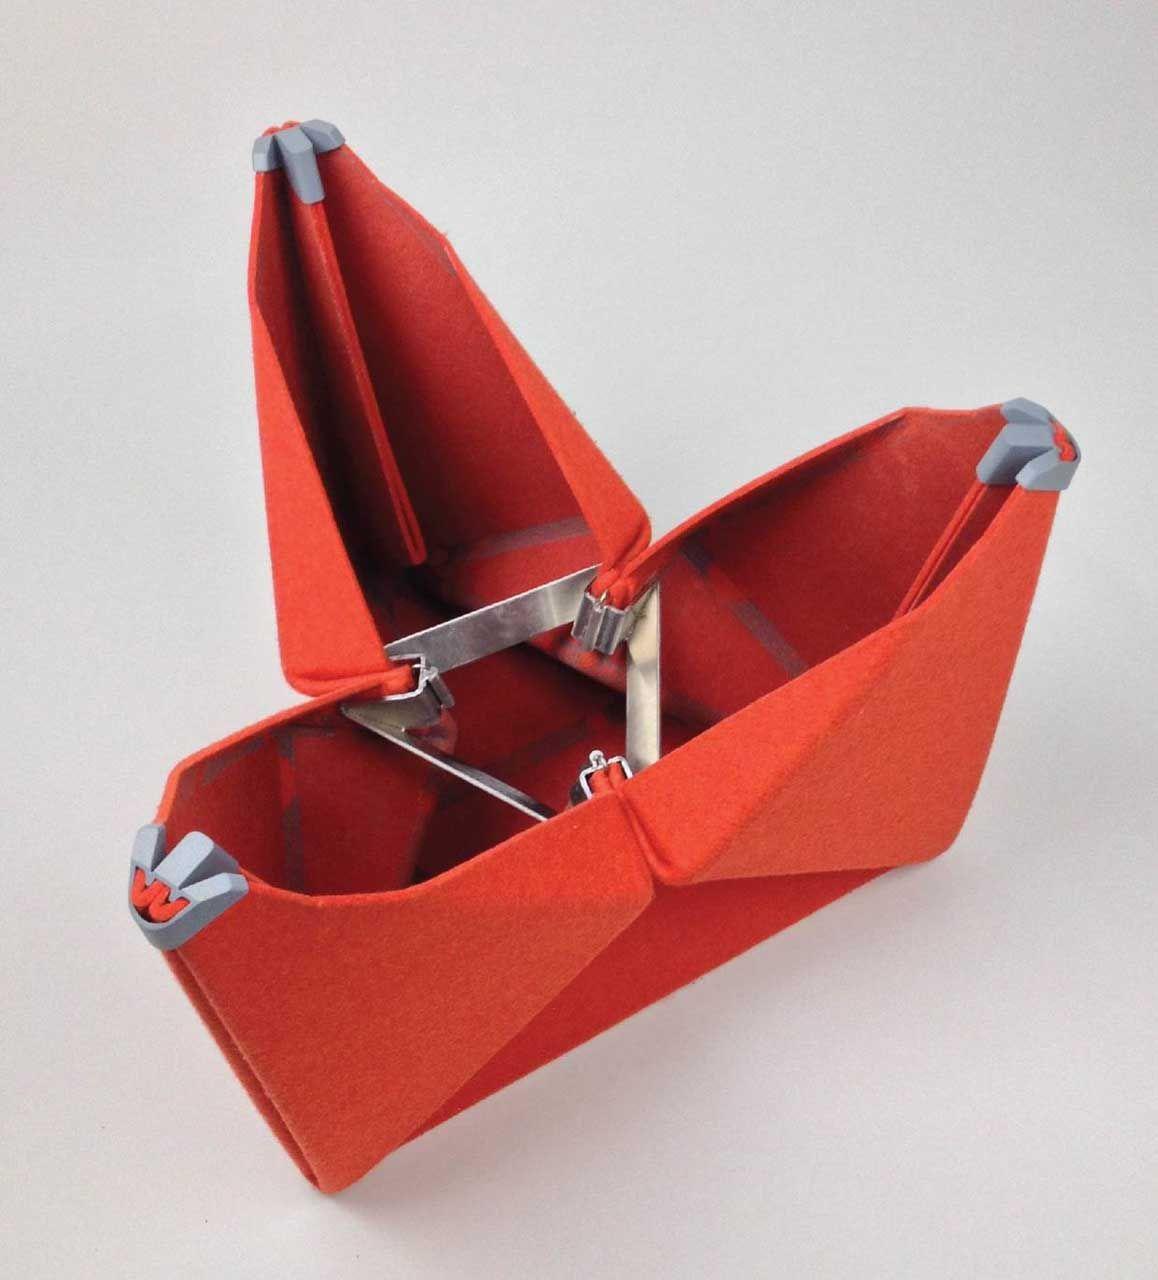 A flat packed origami stool orangutan pinterest stools a flat packed origami stool folding furniturefolding jeuxipadfo Gallery